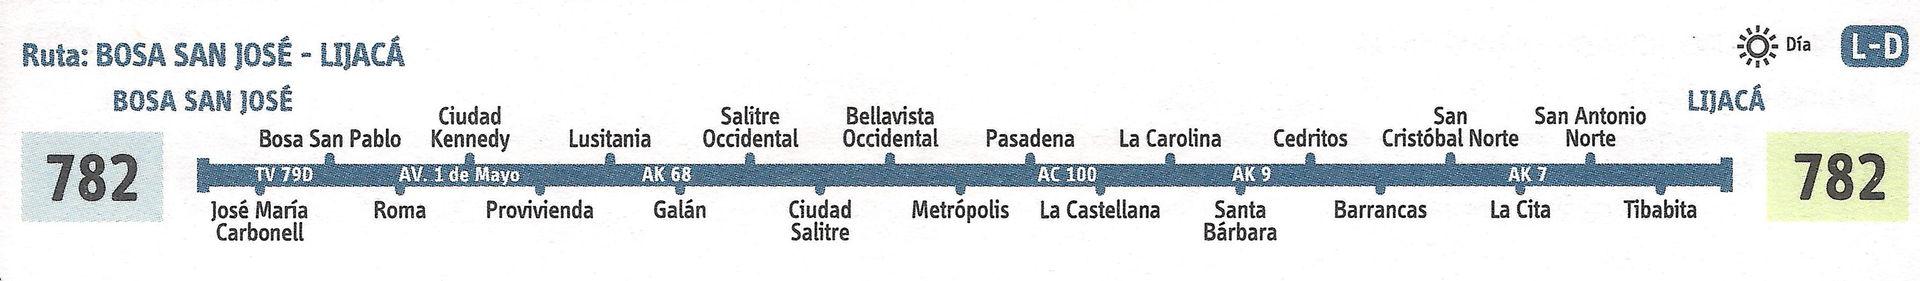 Ruta SITP: 782 Bosa, San José ↔ Lijacá [Urbana] 1